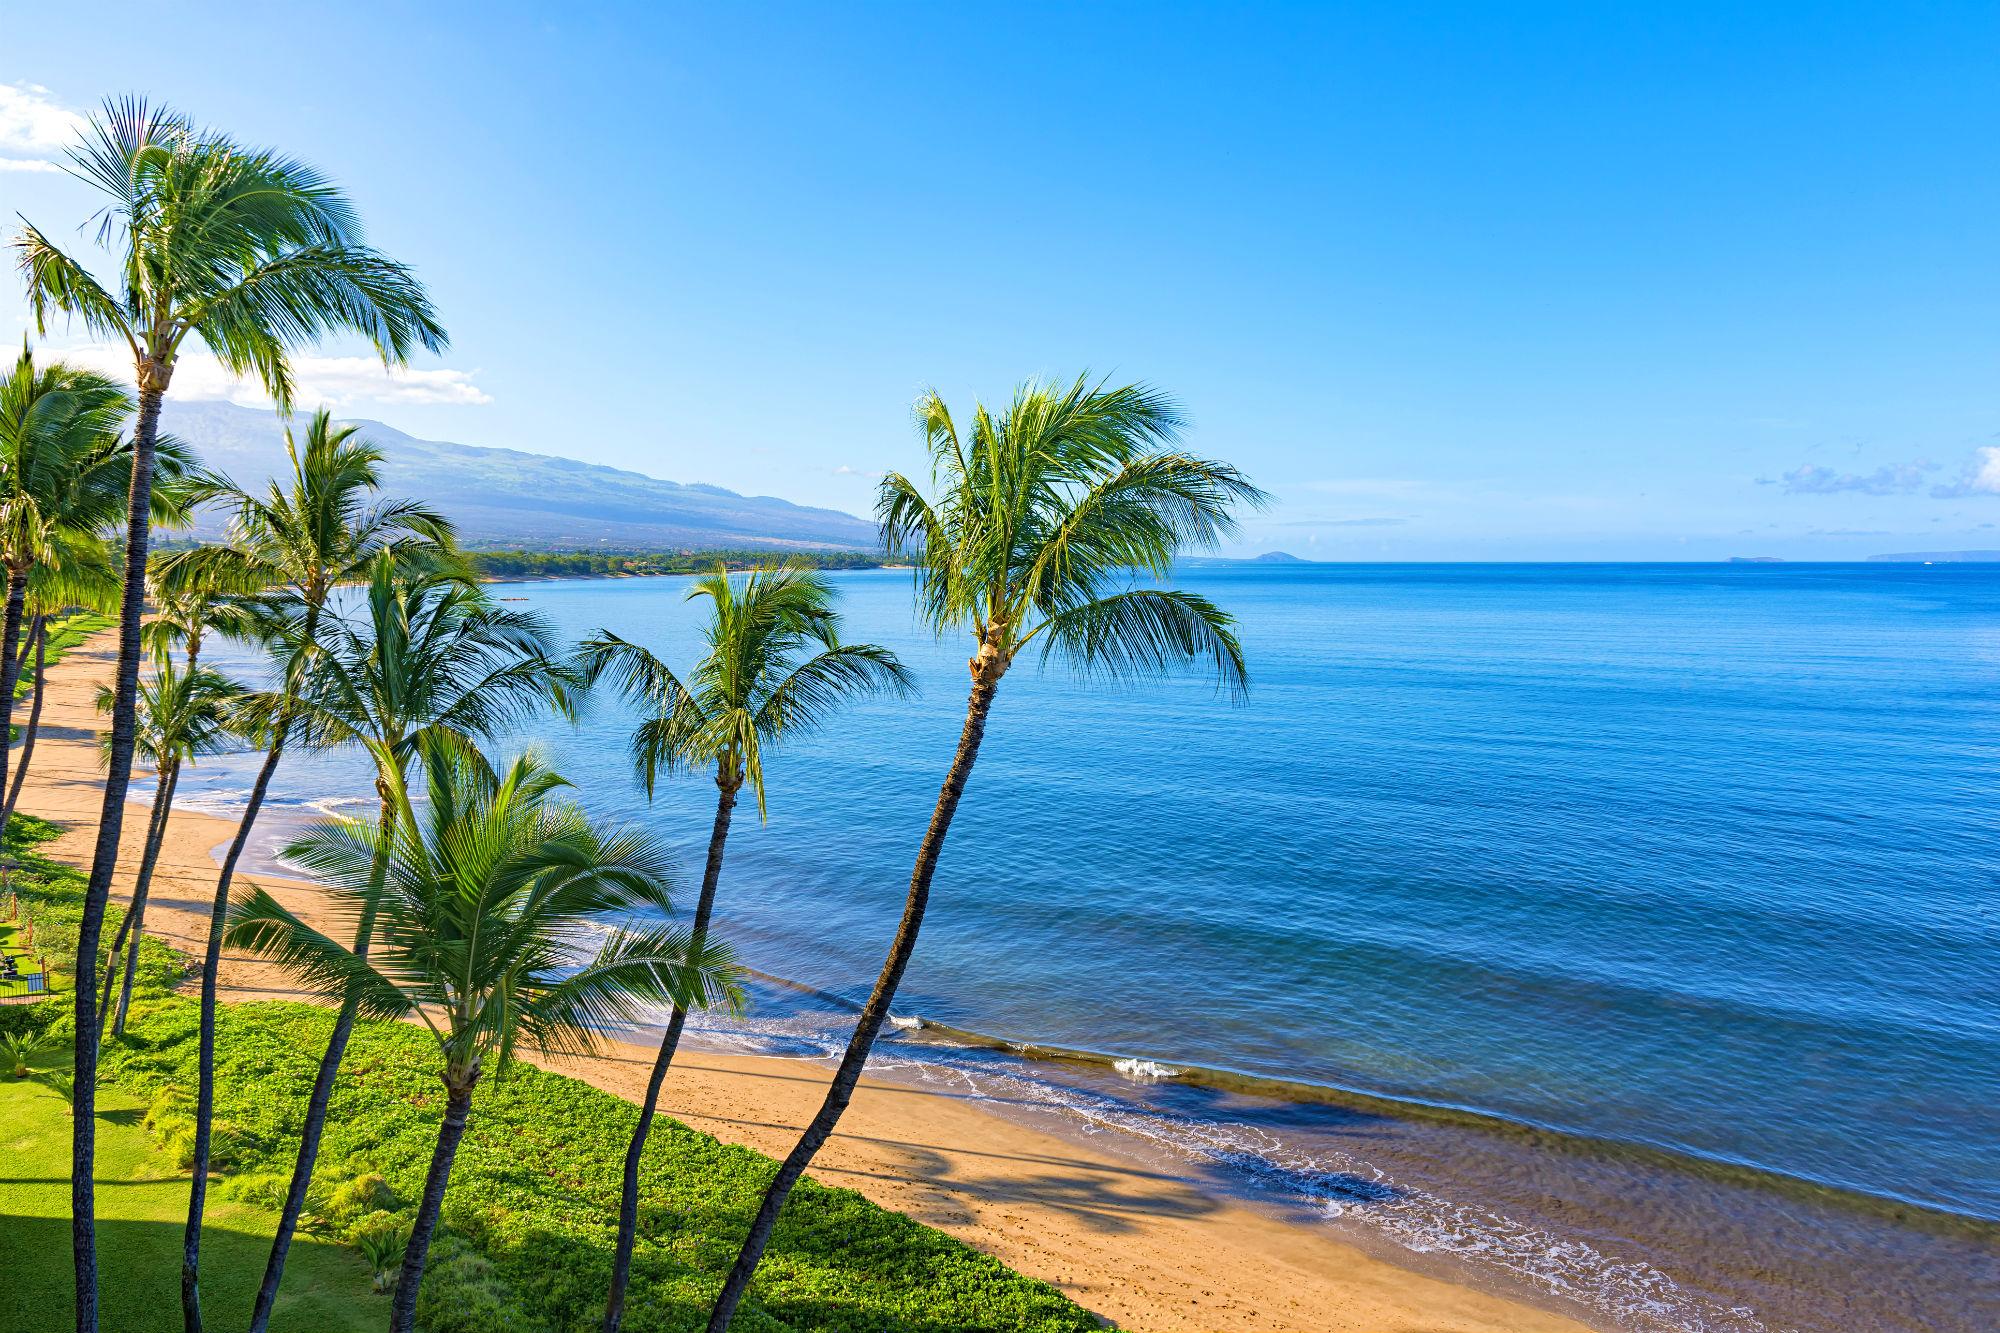 Christian Couples Getaway In Maui Hawaii Love Song Getaway 2019